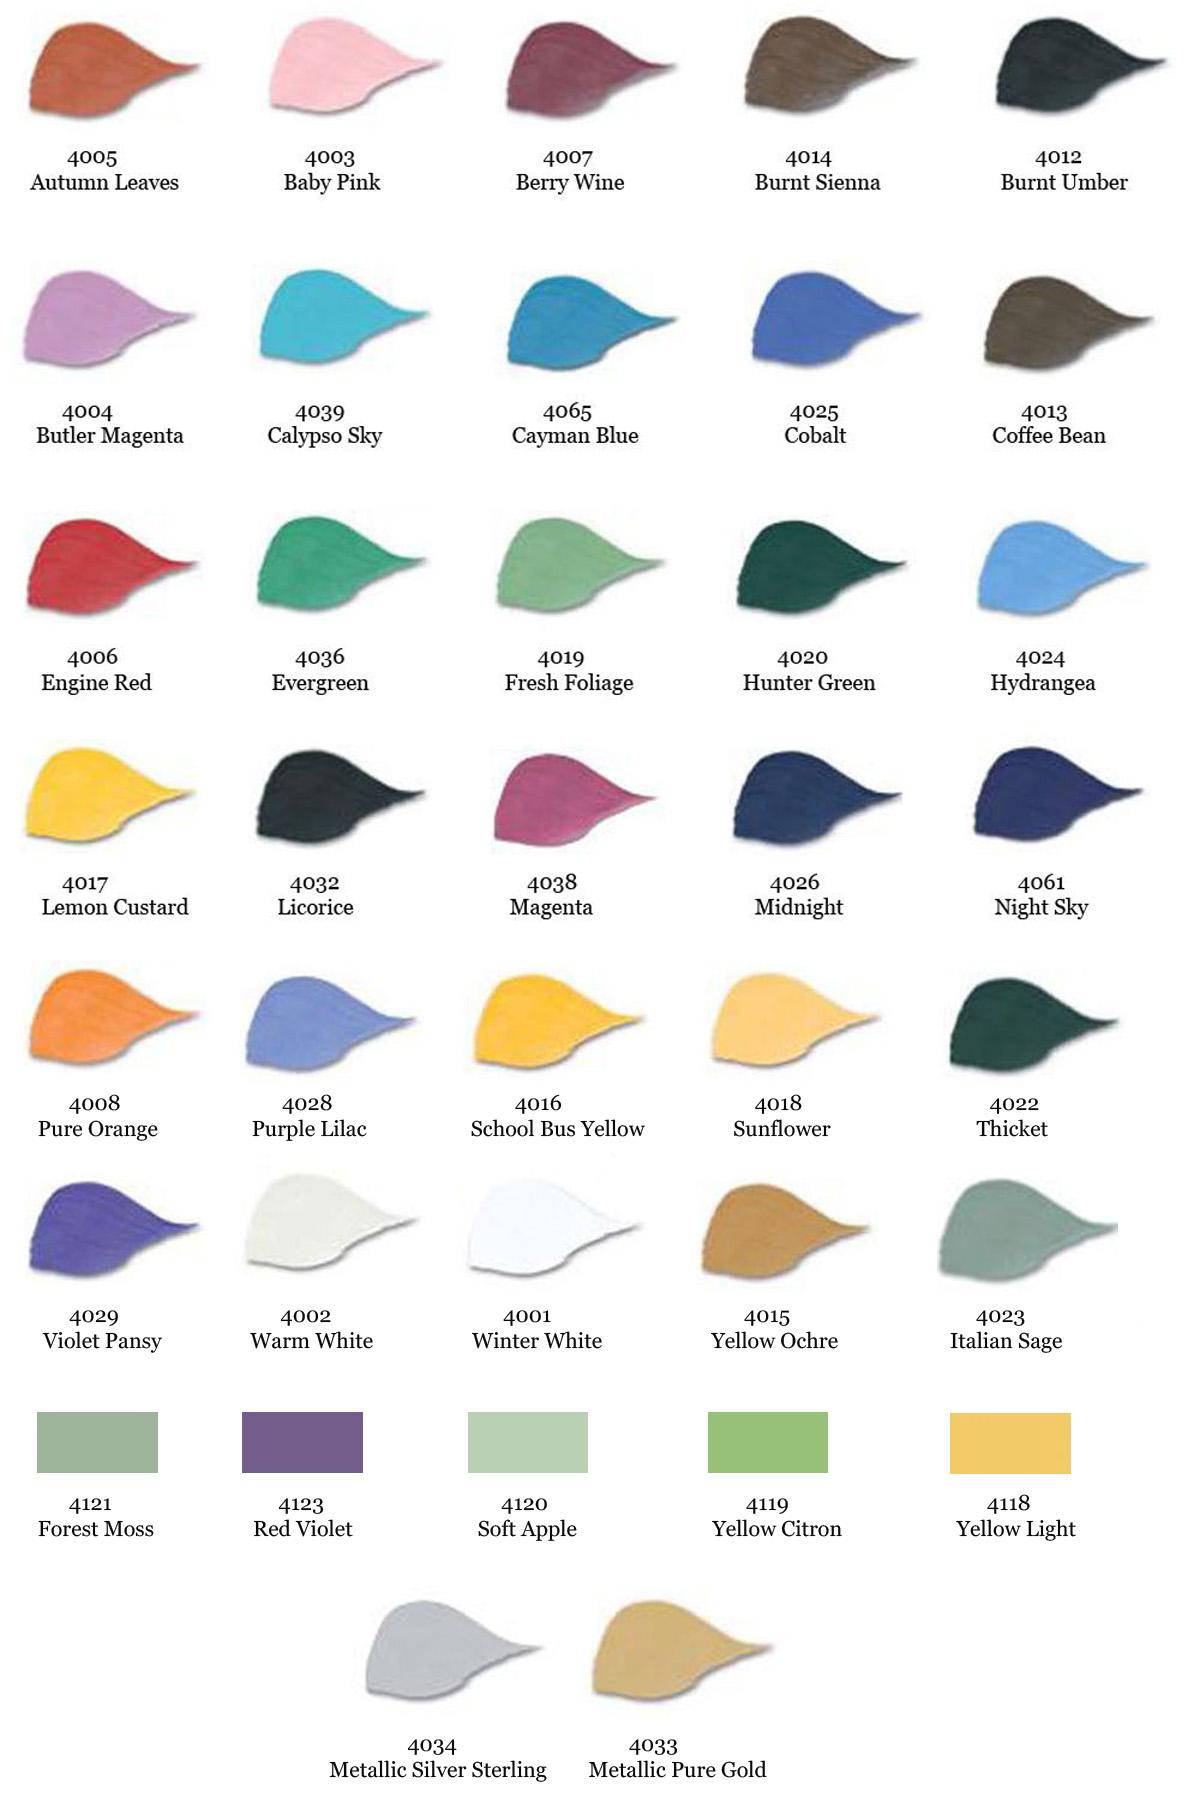 Folk art color chart acrylic paint - Folk Art Color Chart Acrylic Paint 6